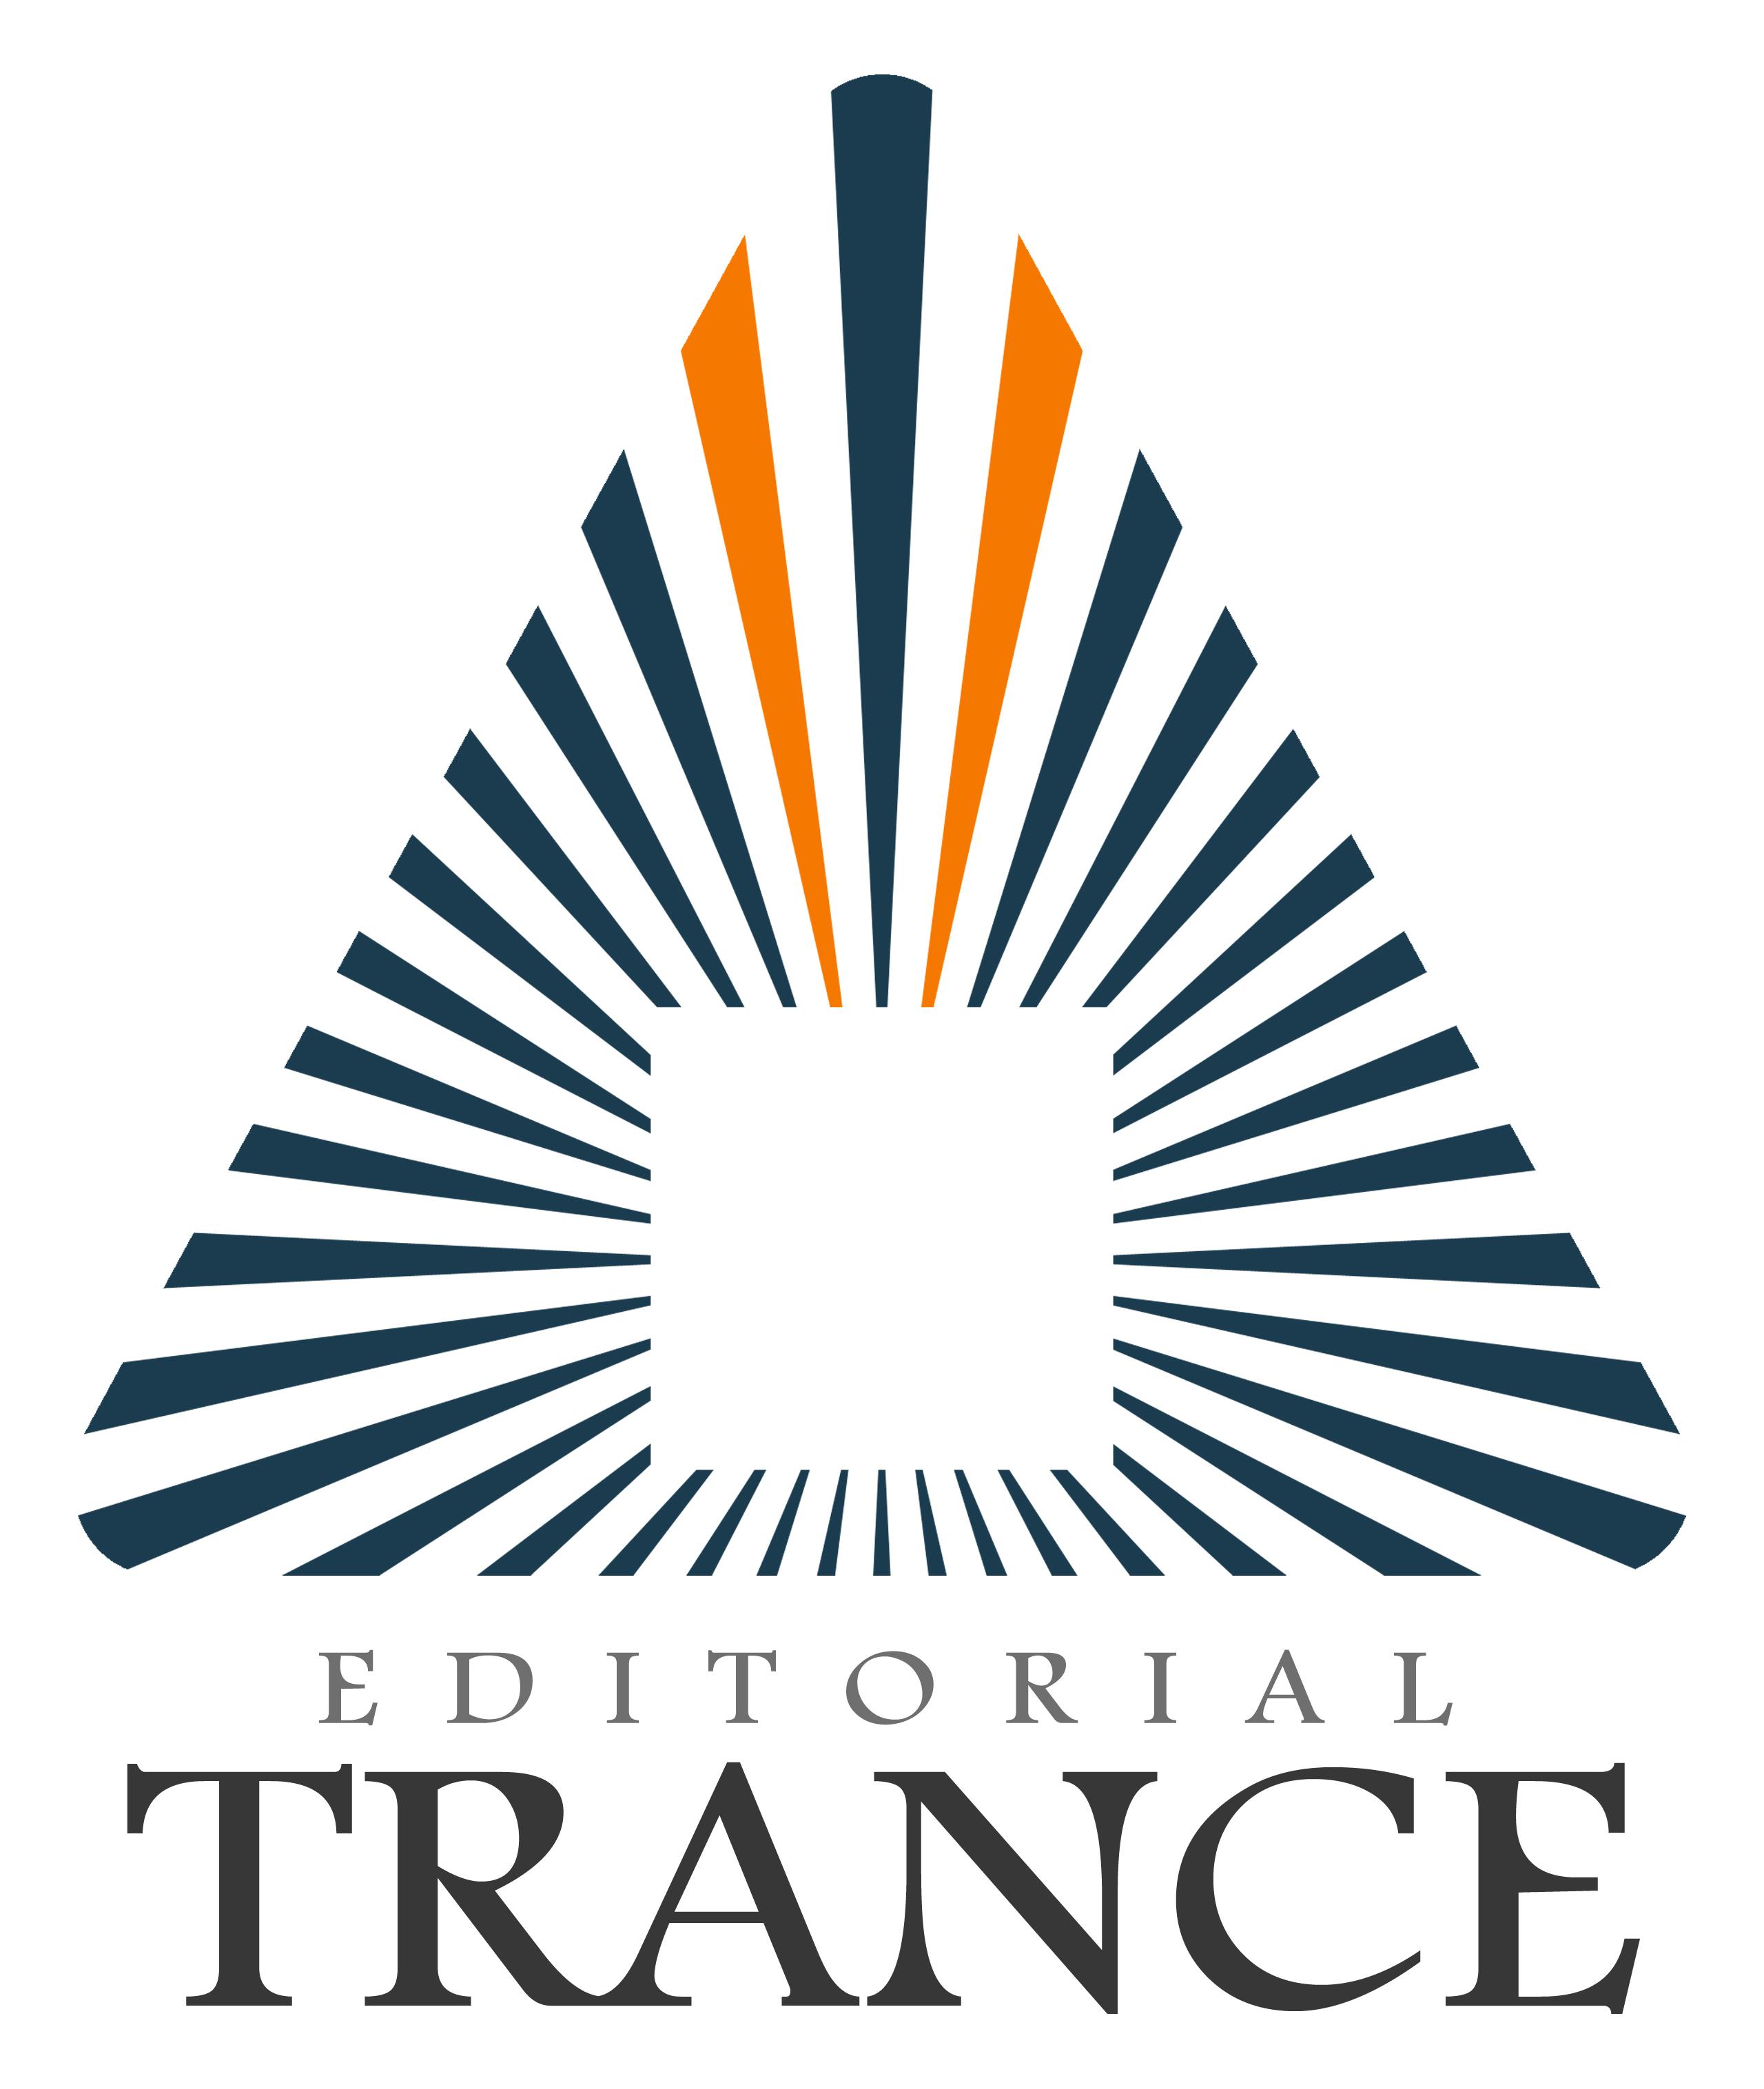 Editorial Trance